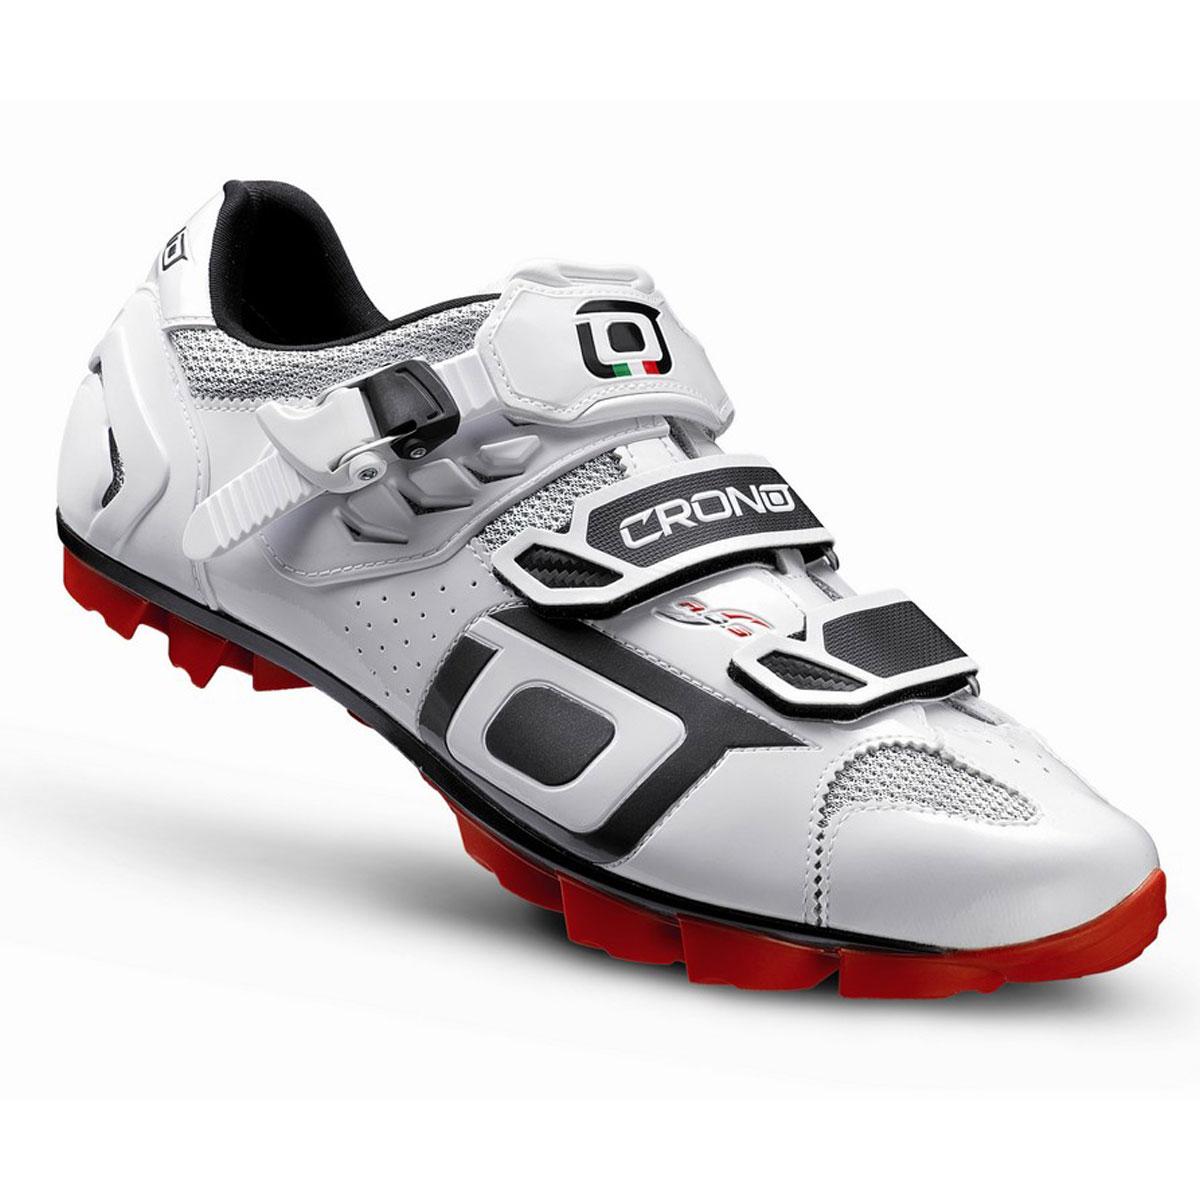 Boty Crono MTB Track white, 38